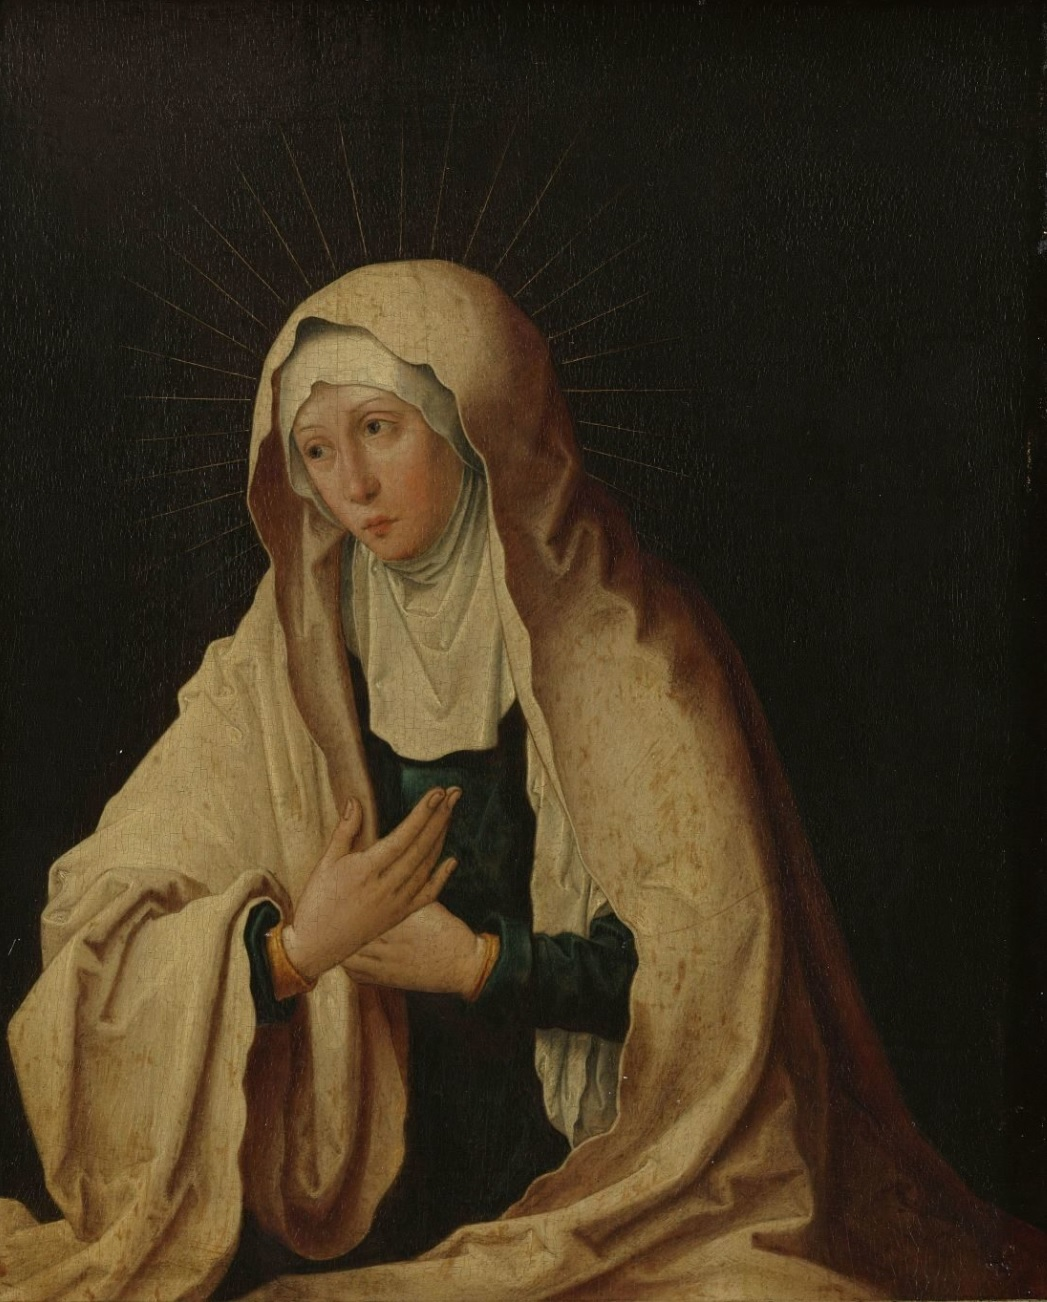 1522 ca copy after Lucas van Leyden, Dolorosa 1557-1600 Rijksmuseum)